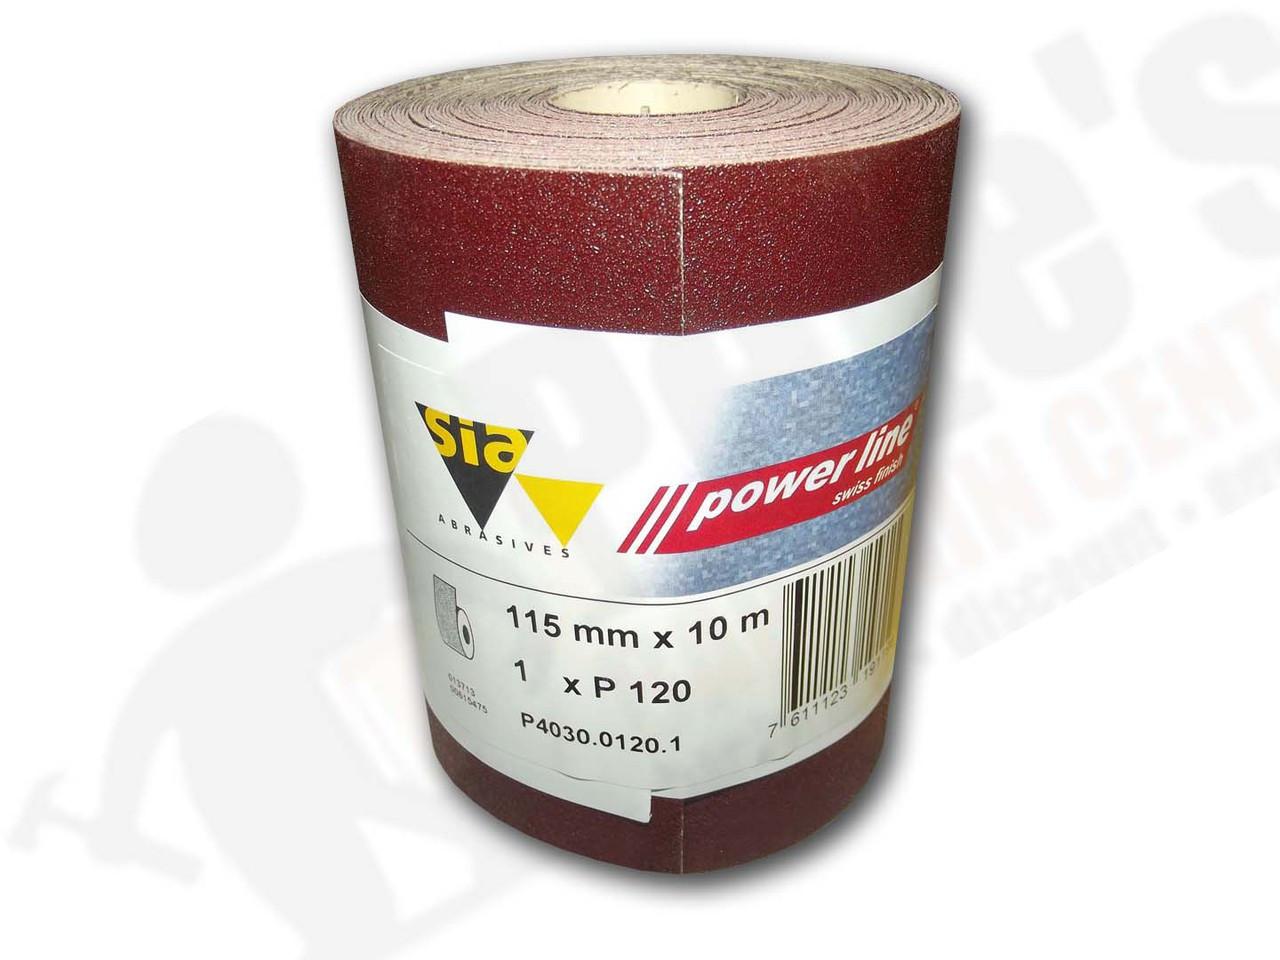 115 mm wide x 10 metre x 120 grit sia Red Sandpaper roll